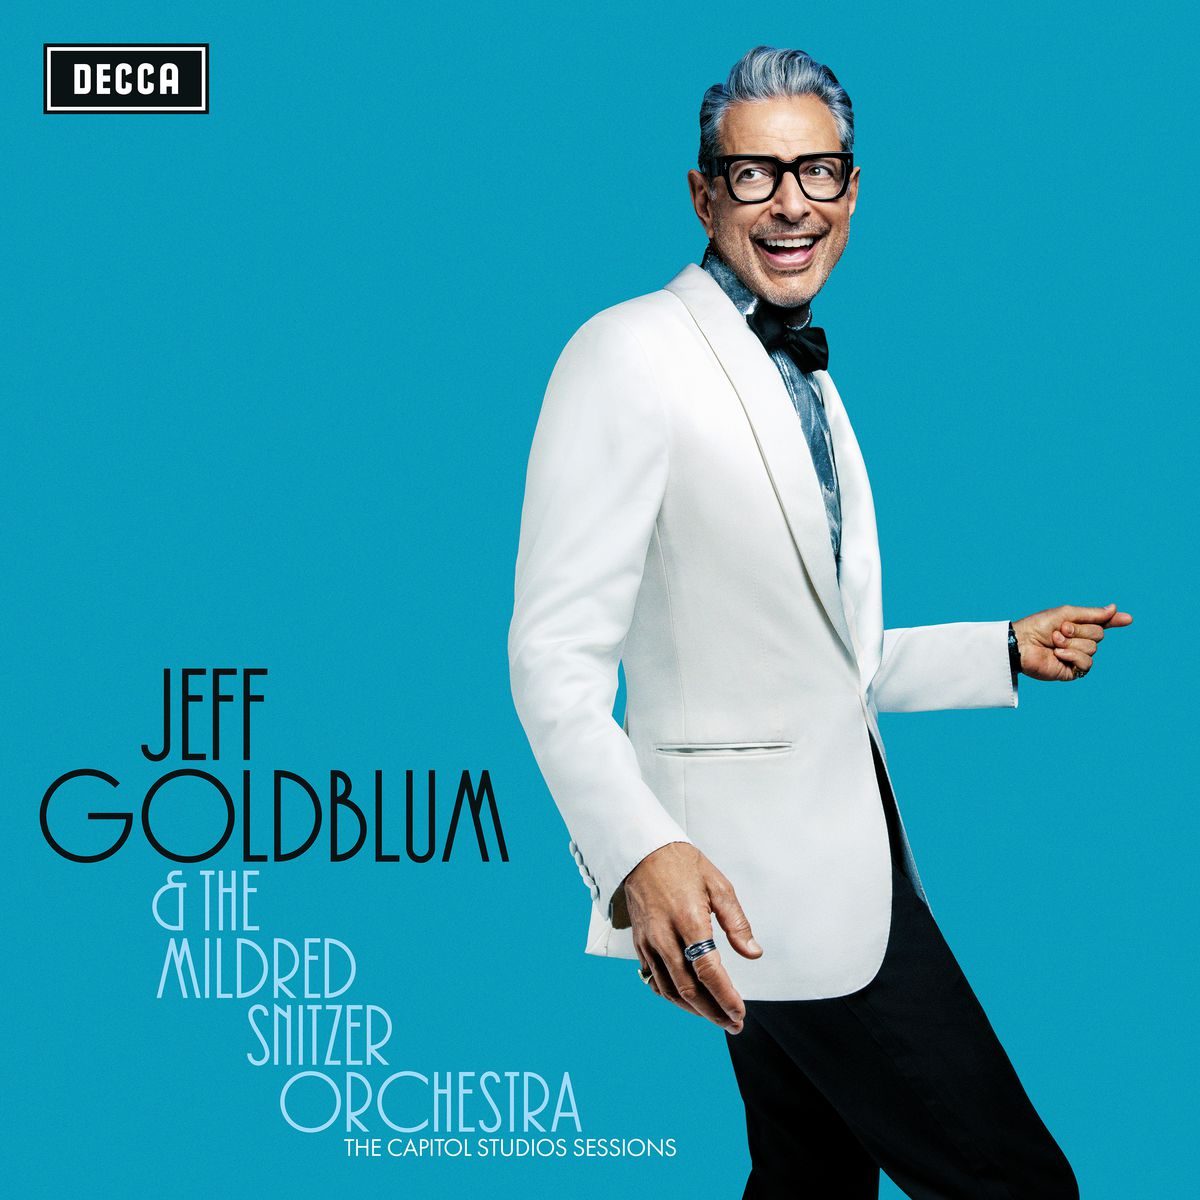 Jeff Goldblum's debut album of jazz standards is an homage to the Golden Age of jazz.   Decca